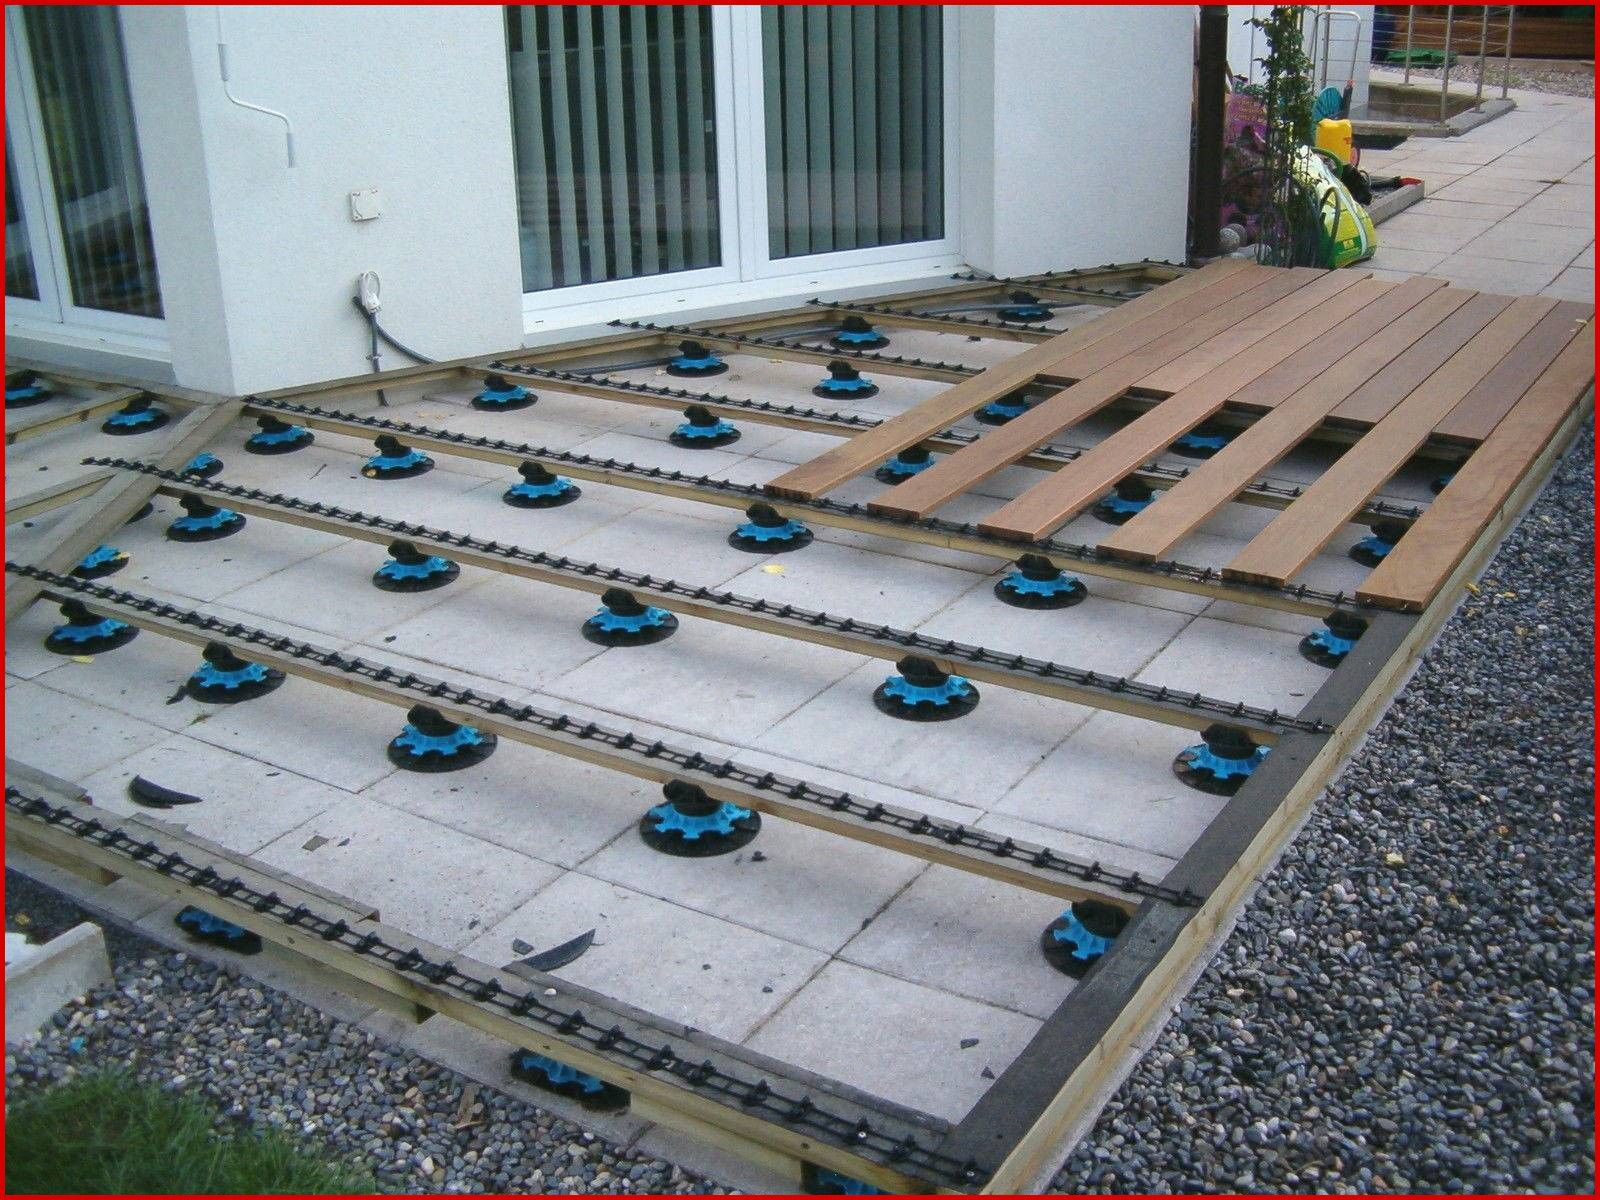 Konzept 40 Fur Wpc Terrasse Unterkonstruktion Check More At Https Www Estadoproperties Com Wp Terrasse Unterkonstruktion Terrasse Inspiration Terrassen Ideen